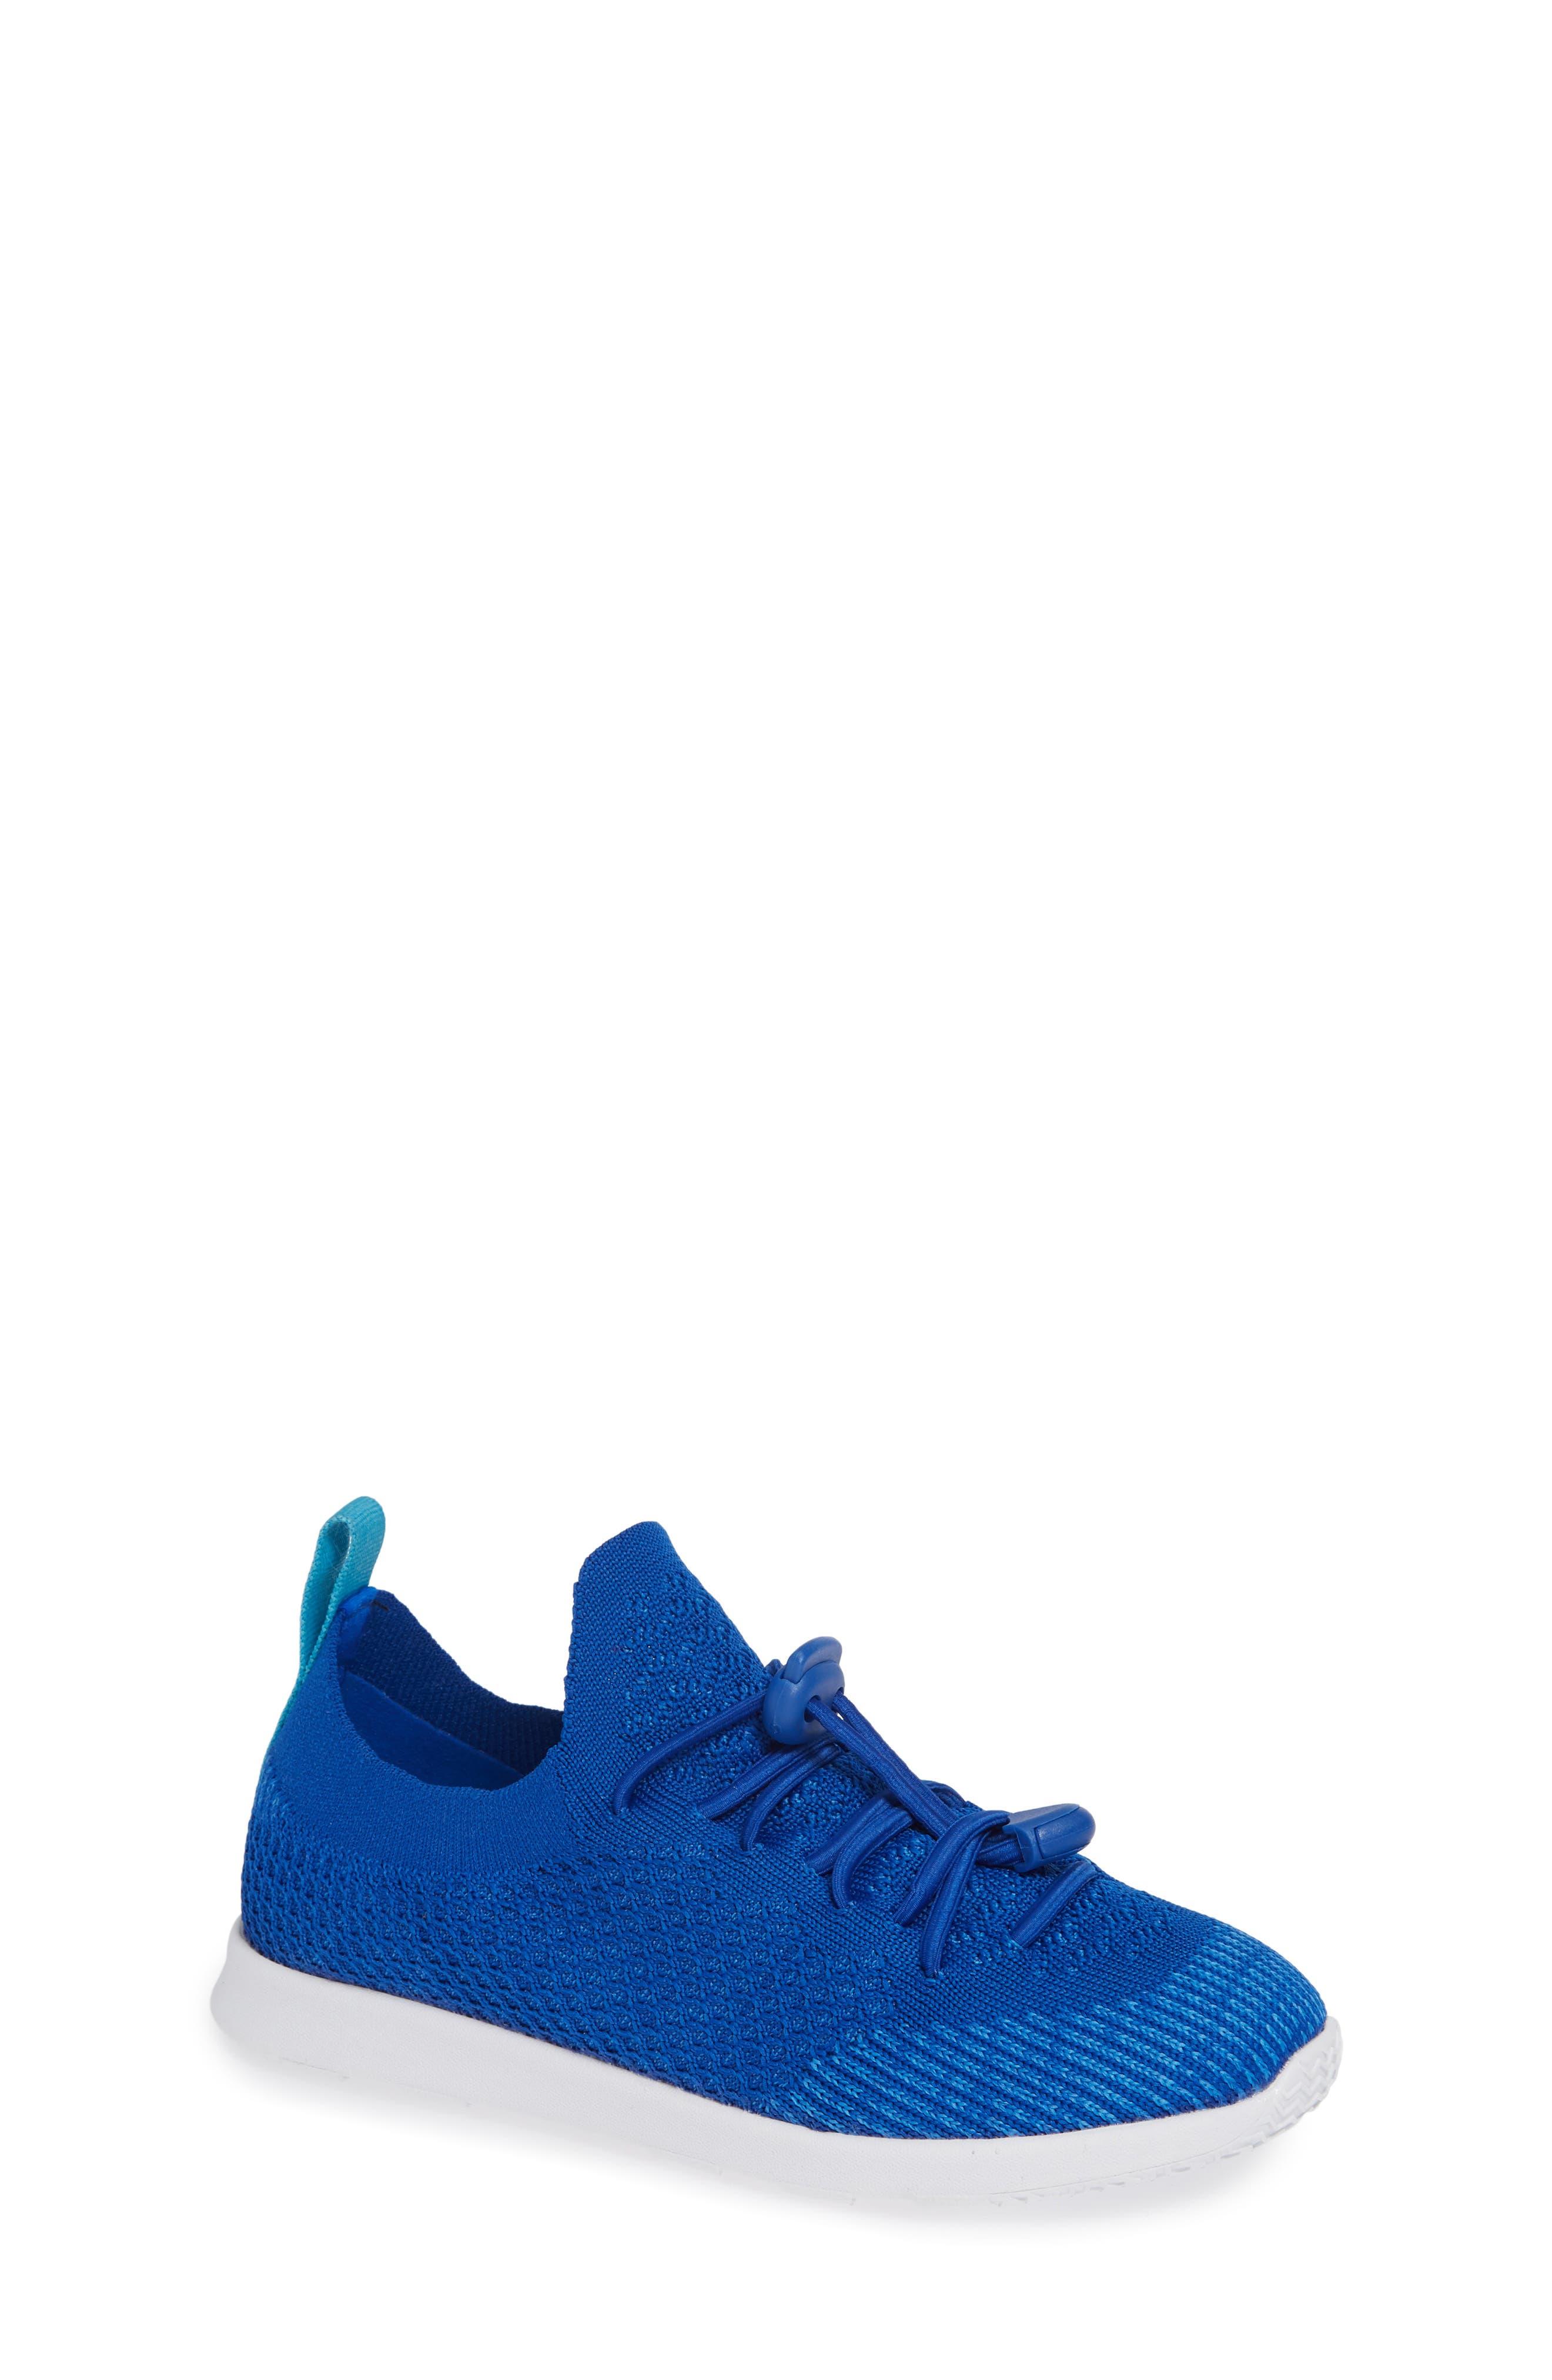 Native Shoes Ap Mercury Liteknit Vegan Sneaker